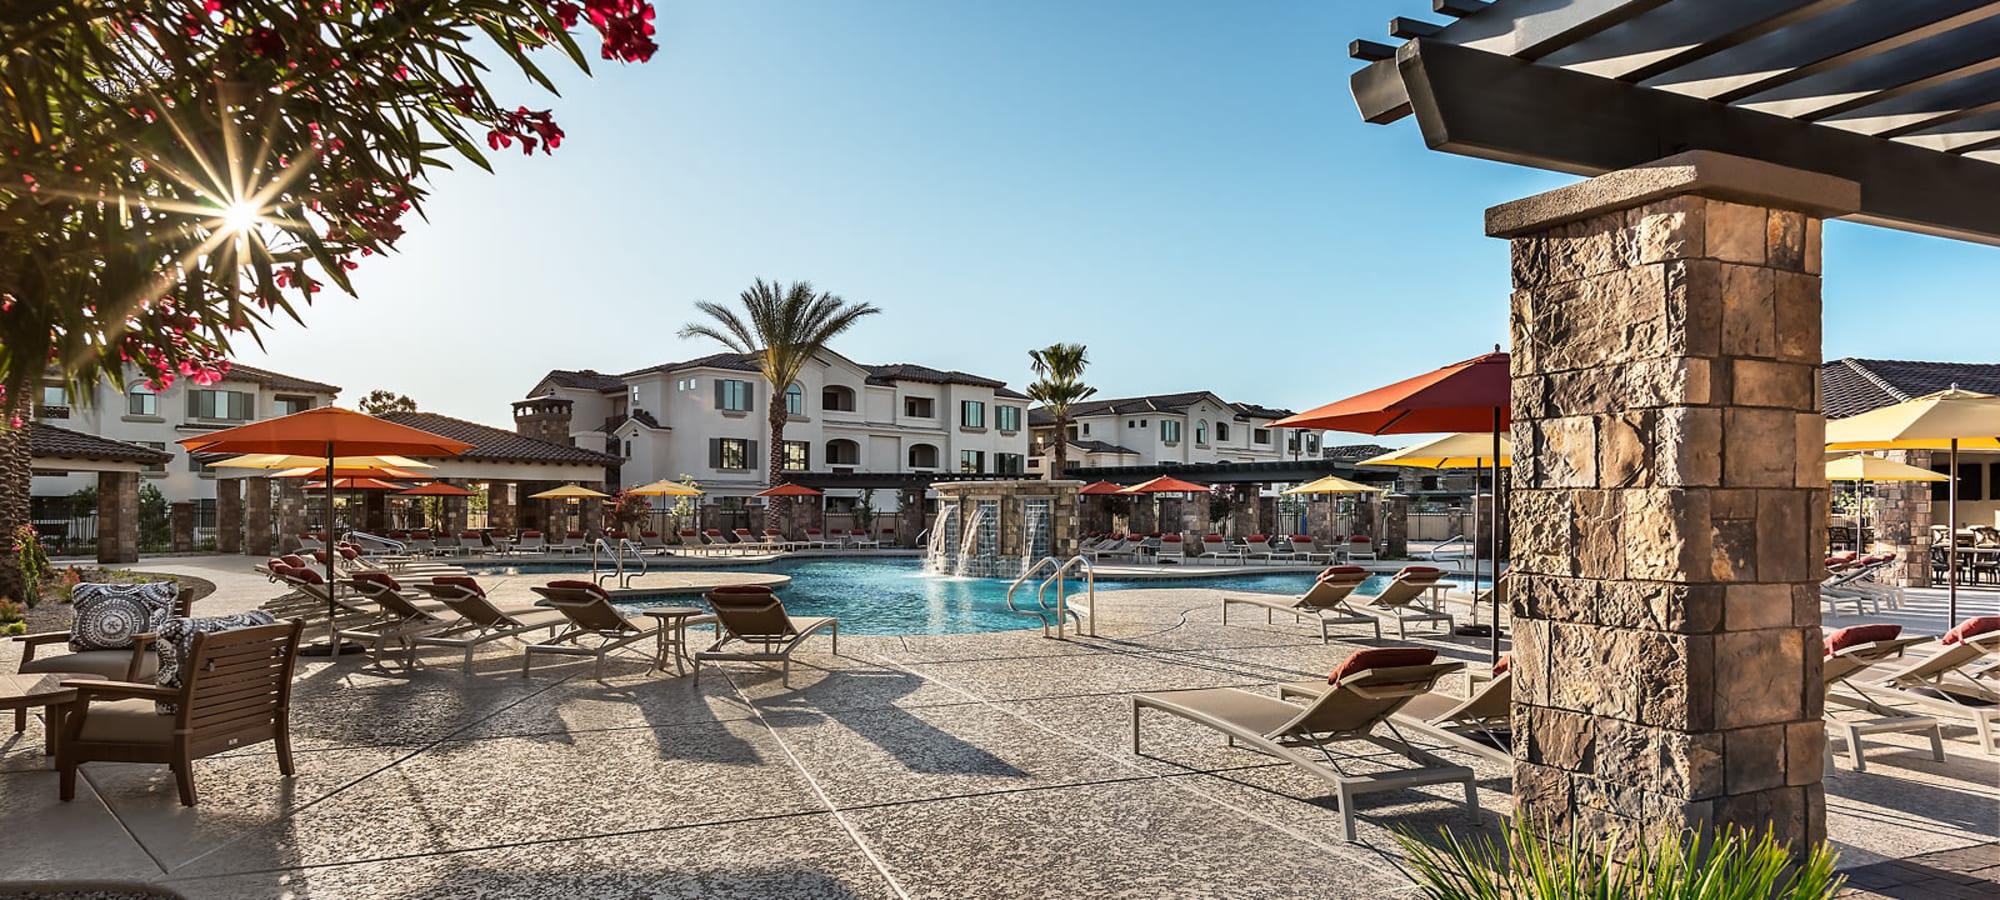 Relaxing poolside lounge at San Artes in Scottsdale, Arizona